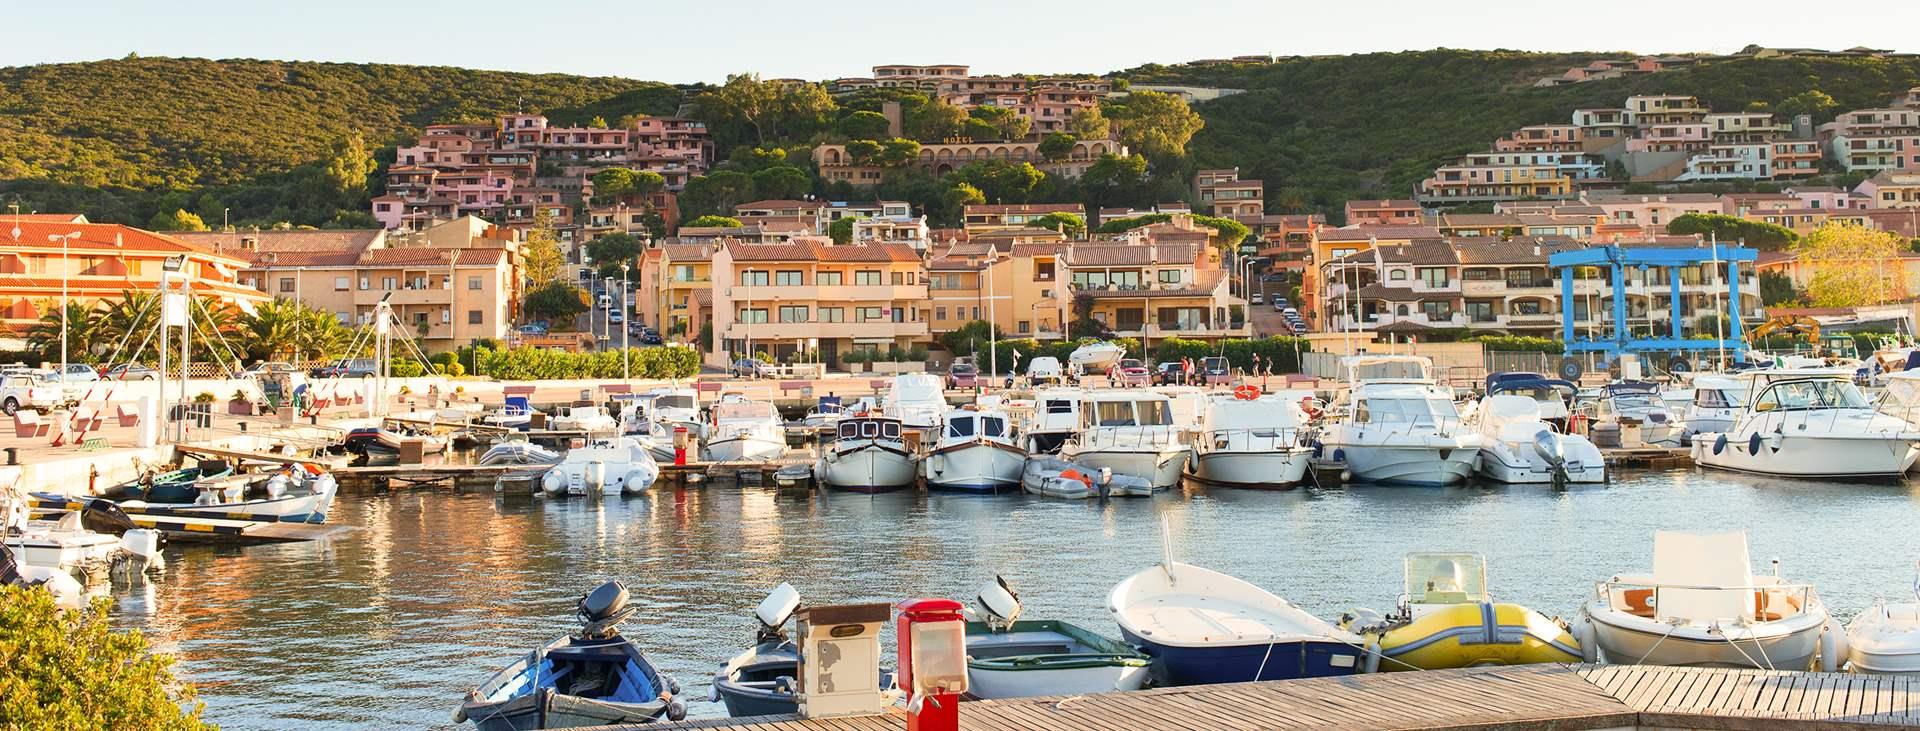 Reiser til Costa Smeralda på Sardinia i Italia